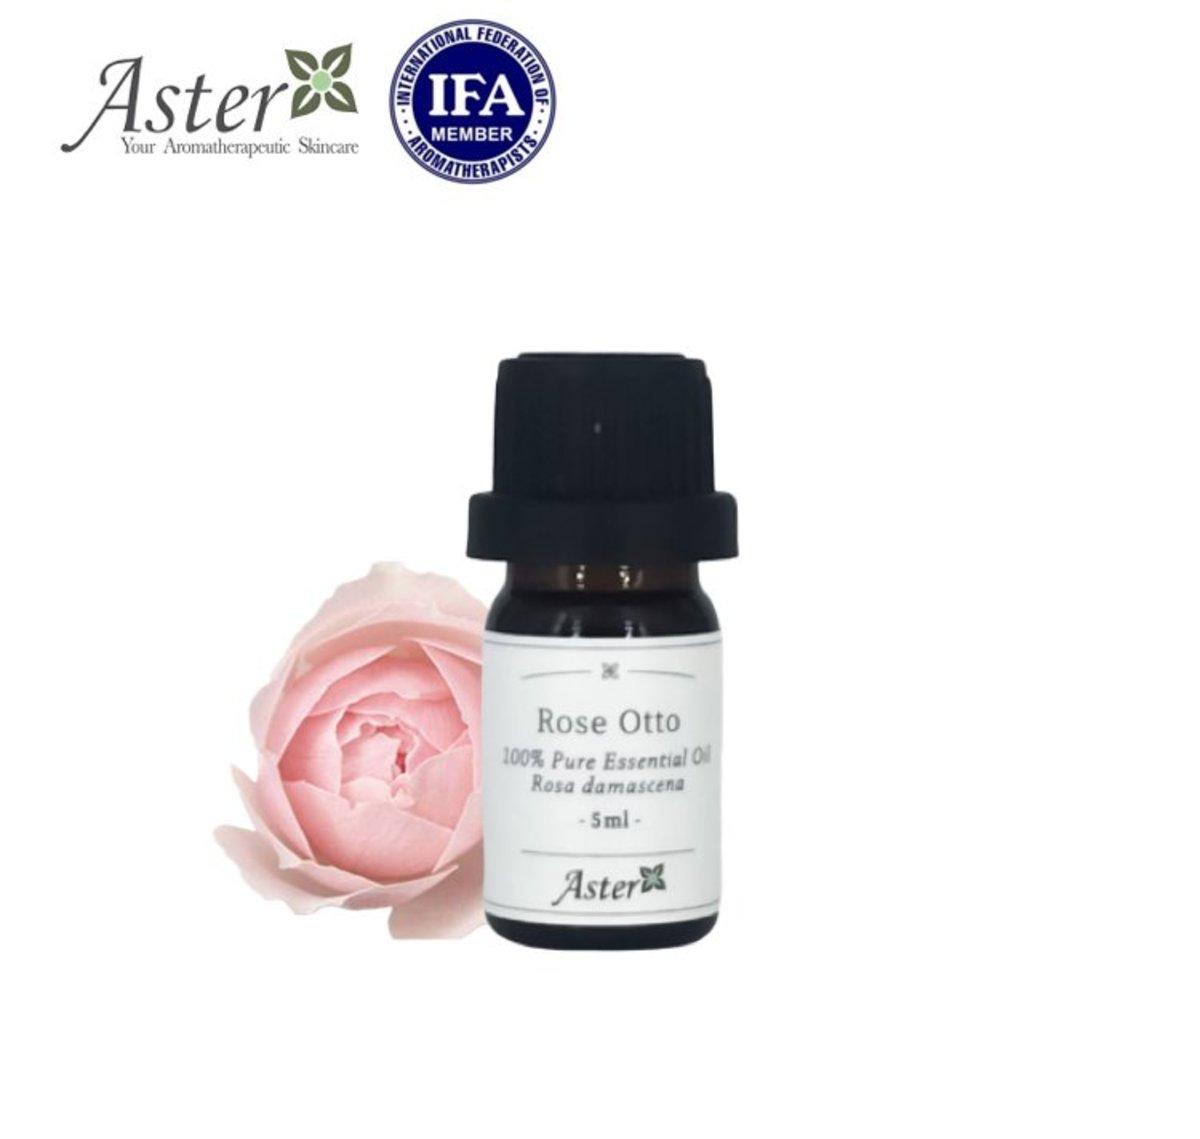 奧圖玫瑰100% 純香薰精油 (Rosa damascena) - 5ml